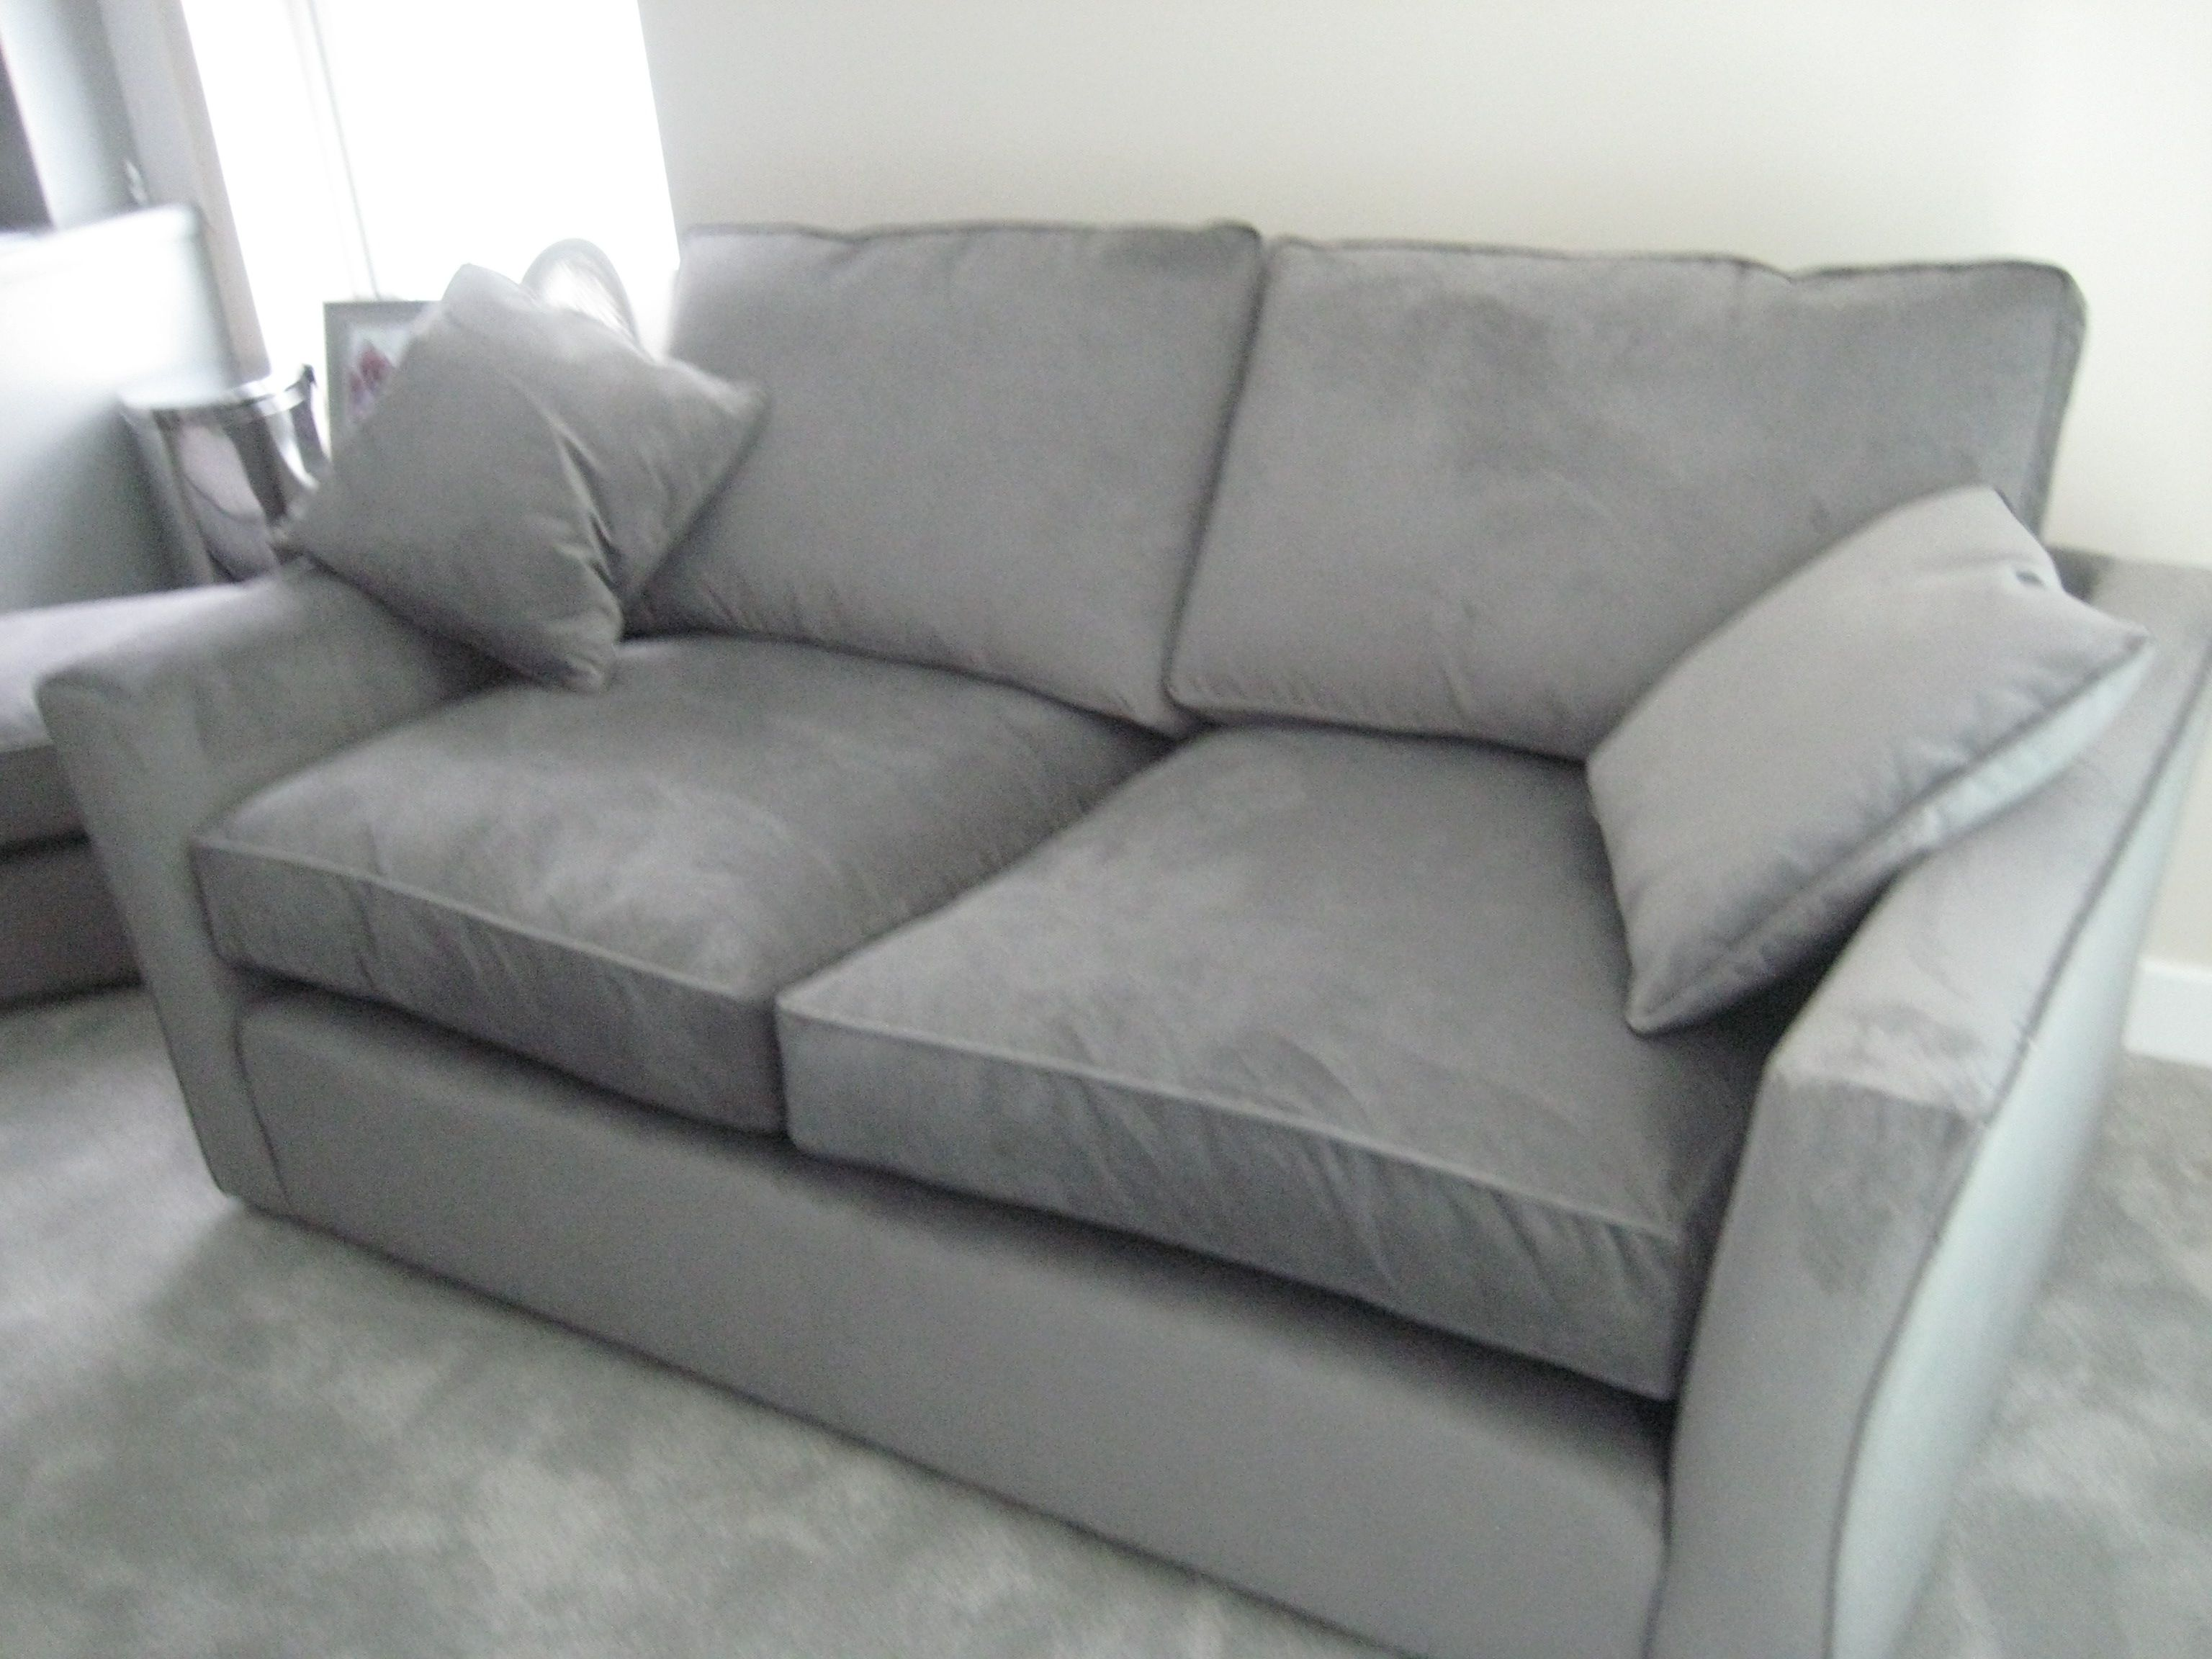 Bespoke U0027deep N Squashyu0027 Sofa In Warwick Fabrics Plush Velvet. It Sits As